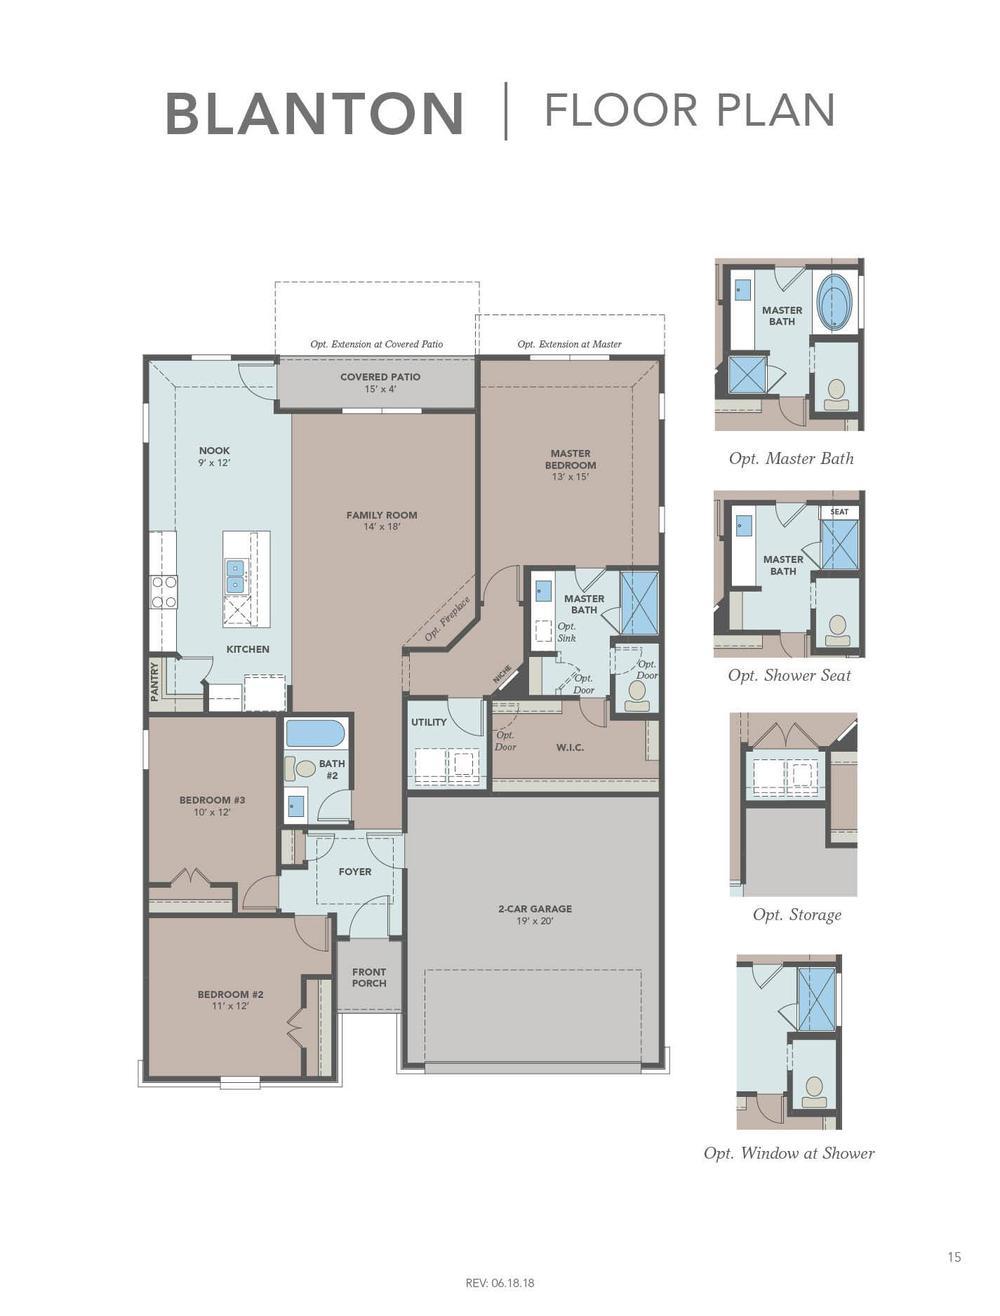 Blanton Floor Plan